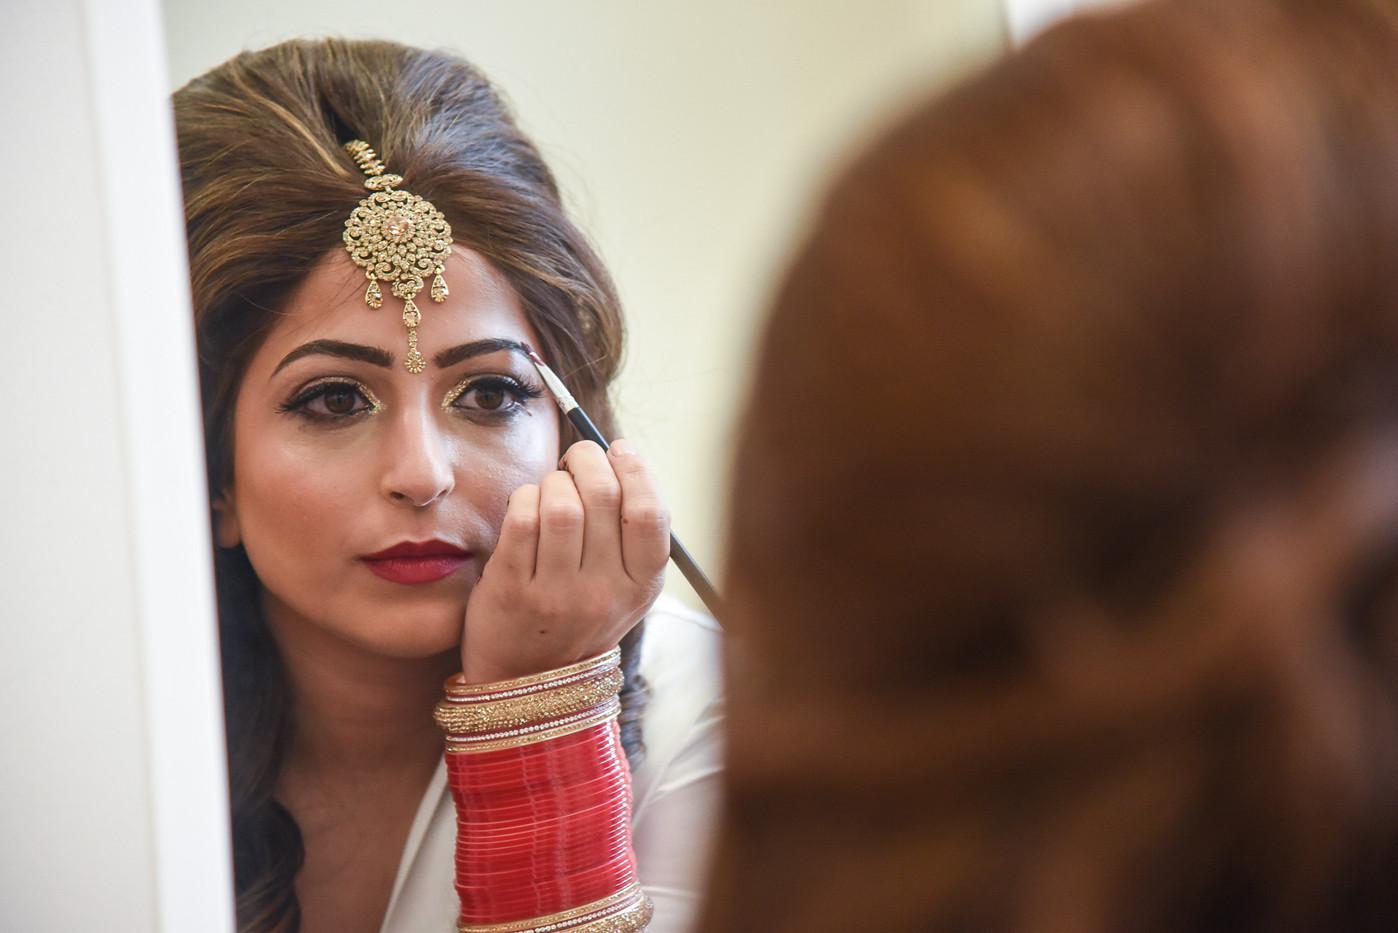 aisan-bride-getting-ready-make-up.jpg